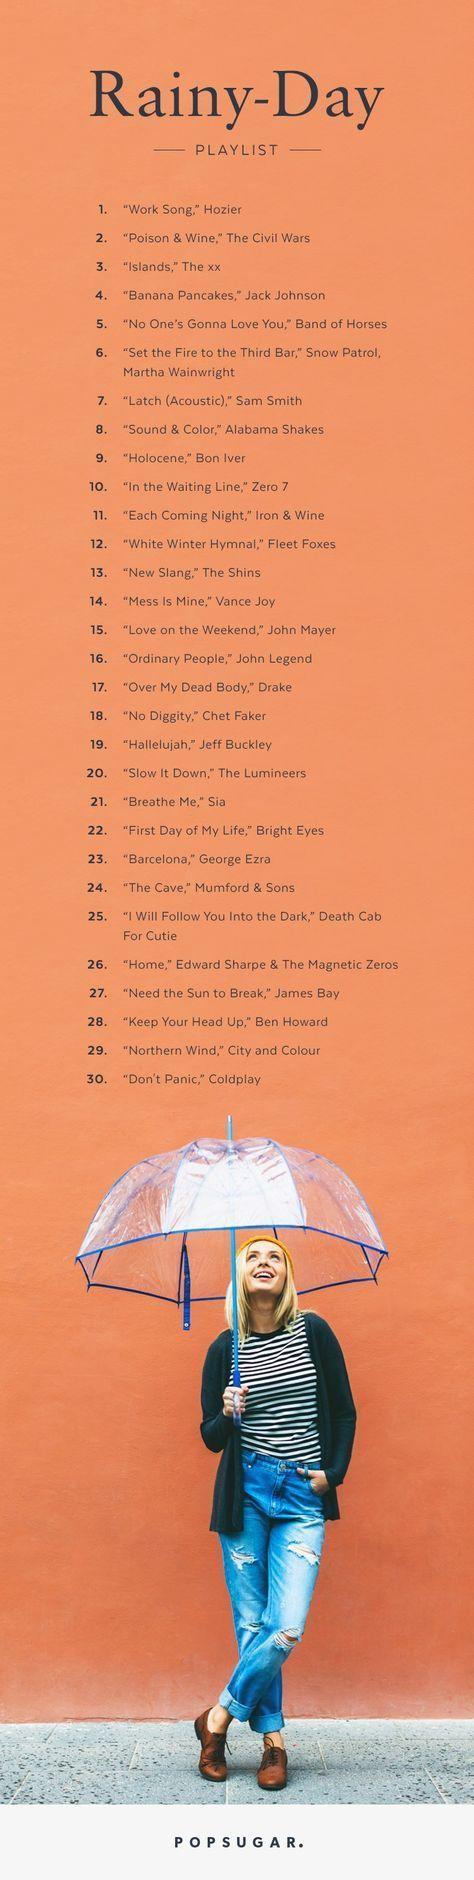 The Perfect Playlist For a Rainy Day #bestkaraokemachine